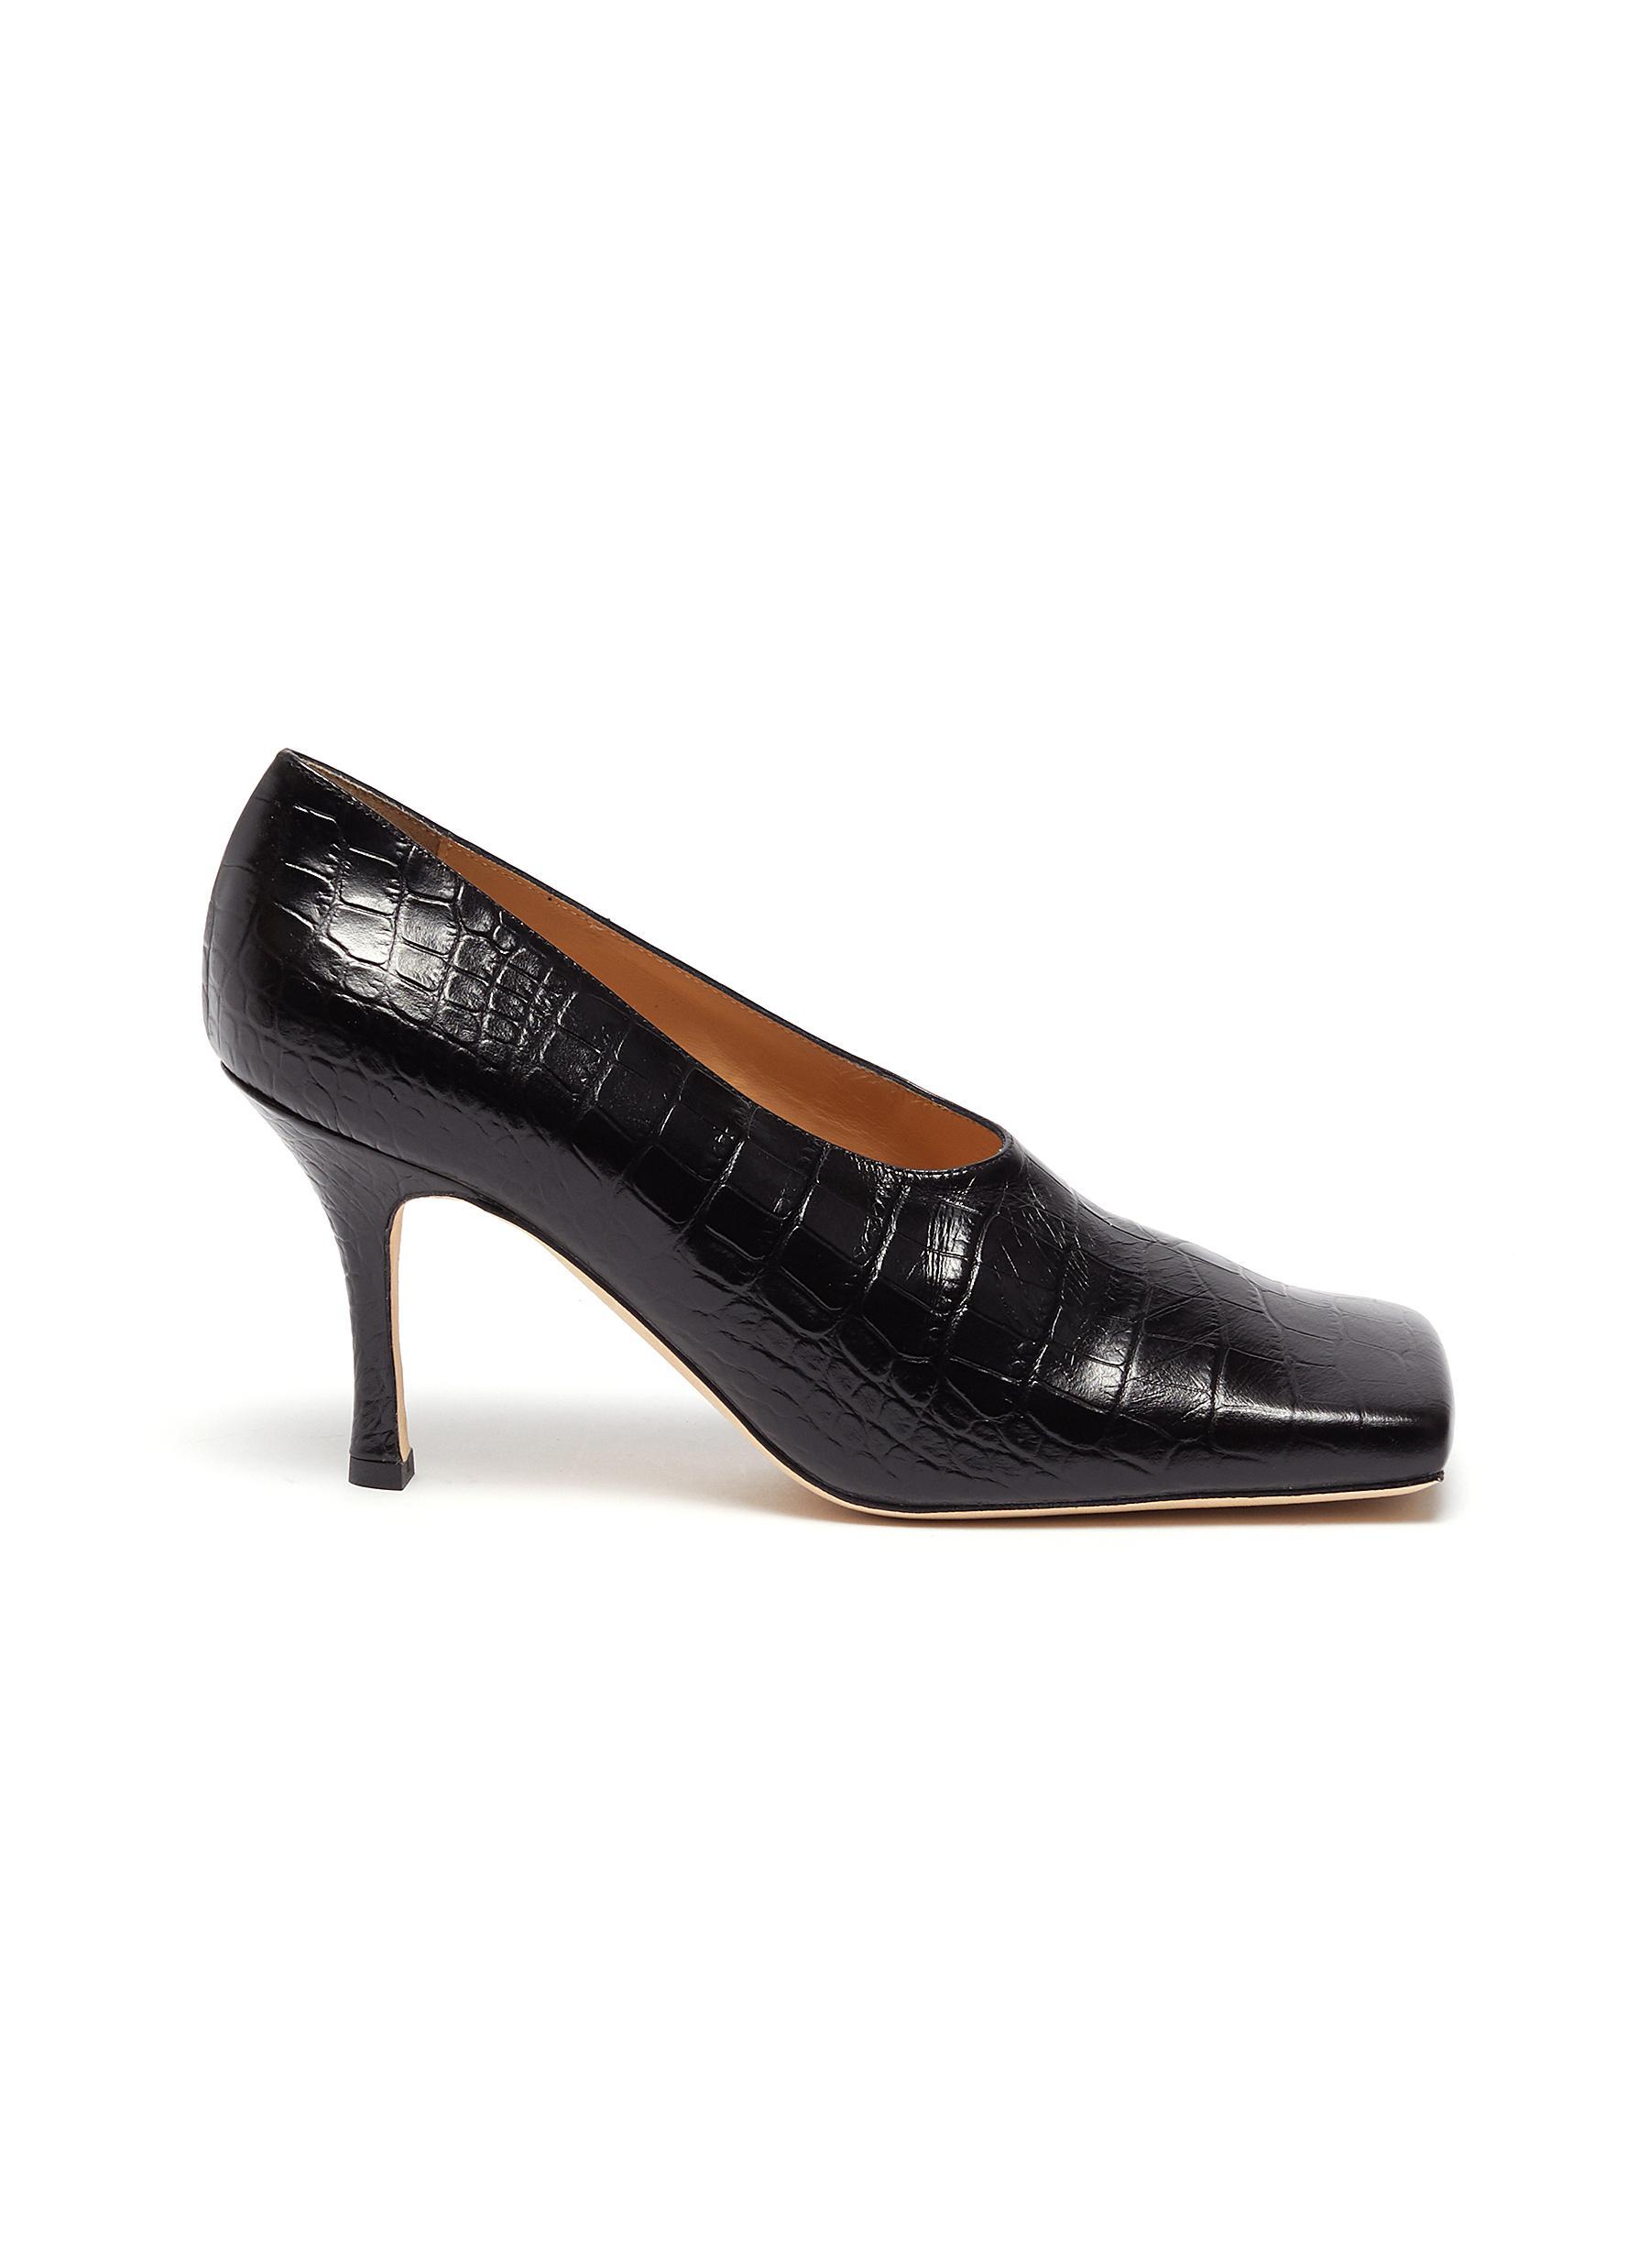 A.W.A.K.E. Mode High Heels Matilda square toe croc embossed leather pumps